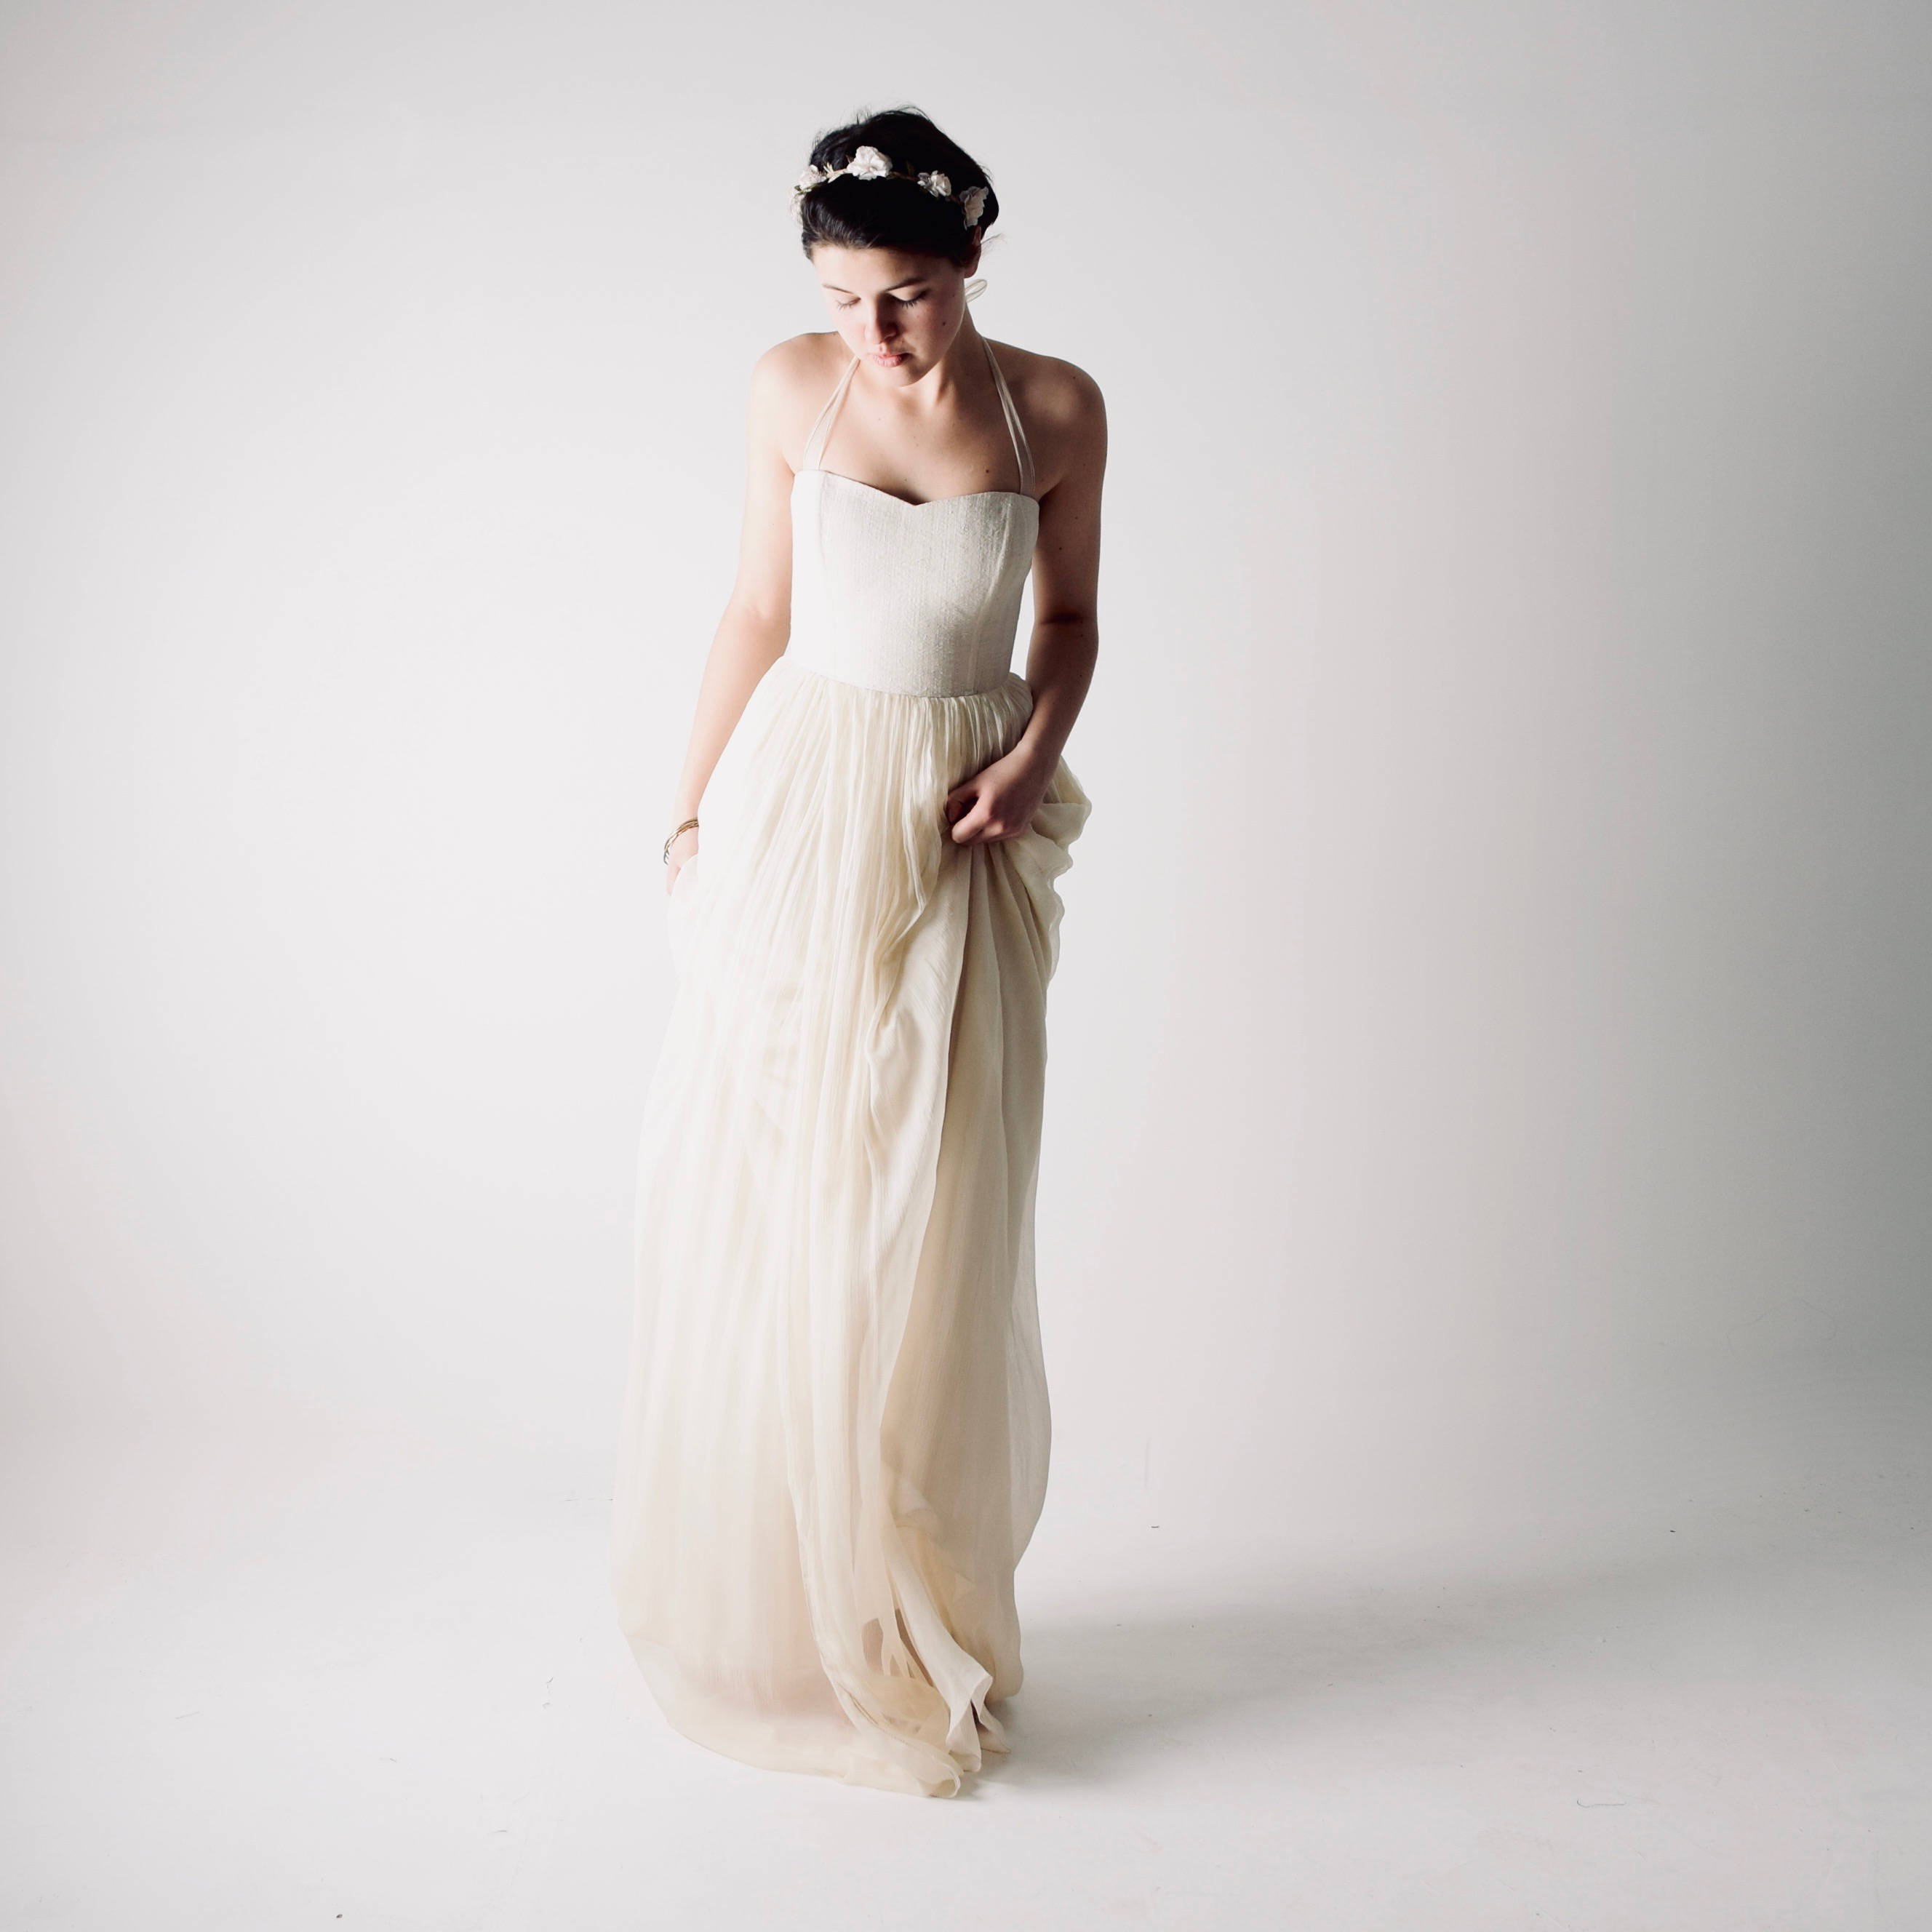 Tilia ~ Hemp Wedding Dress - Larimeloom Handmade Clothing